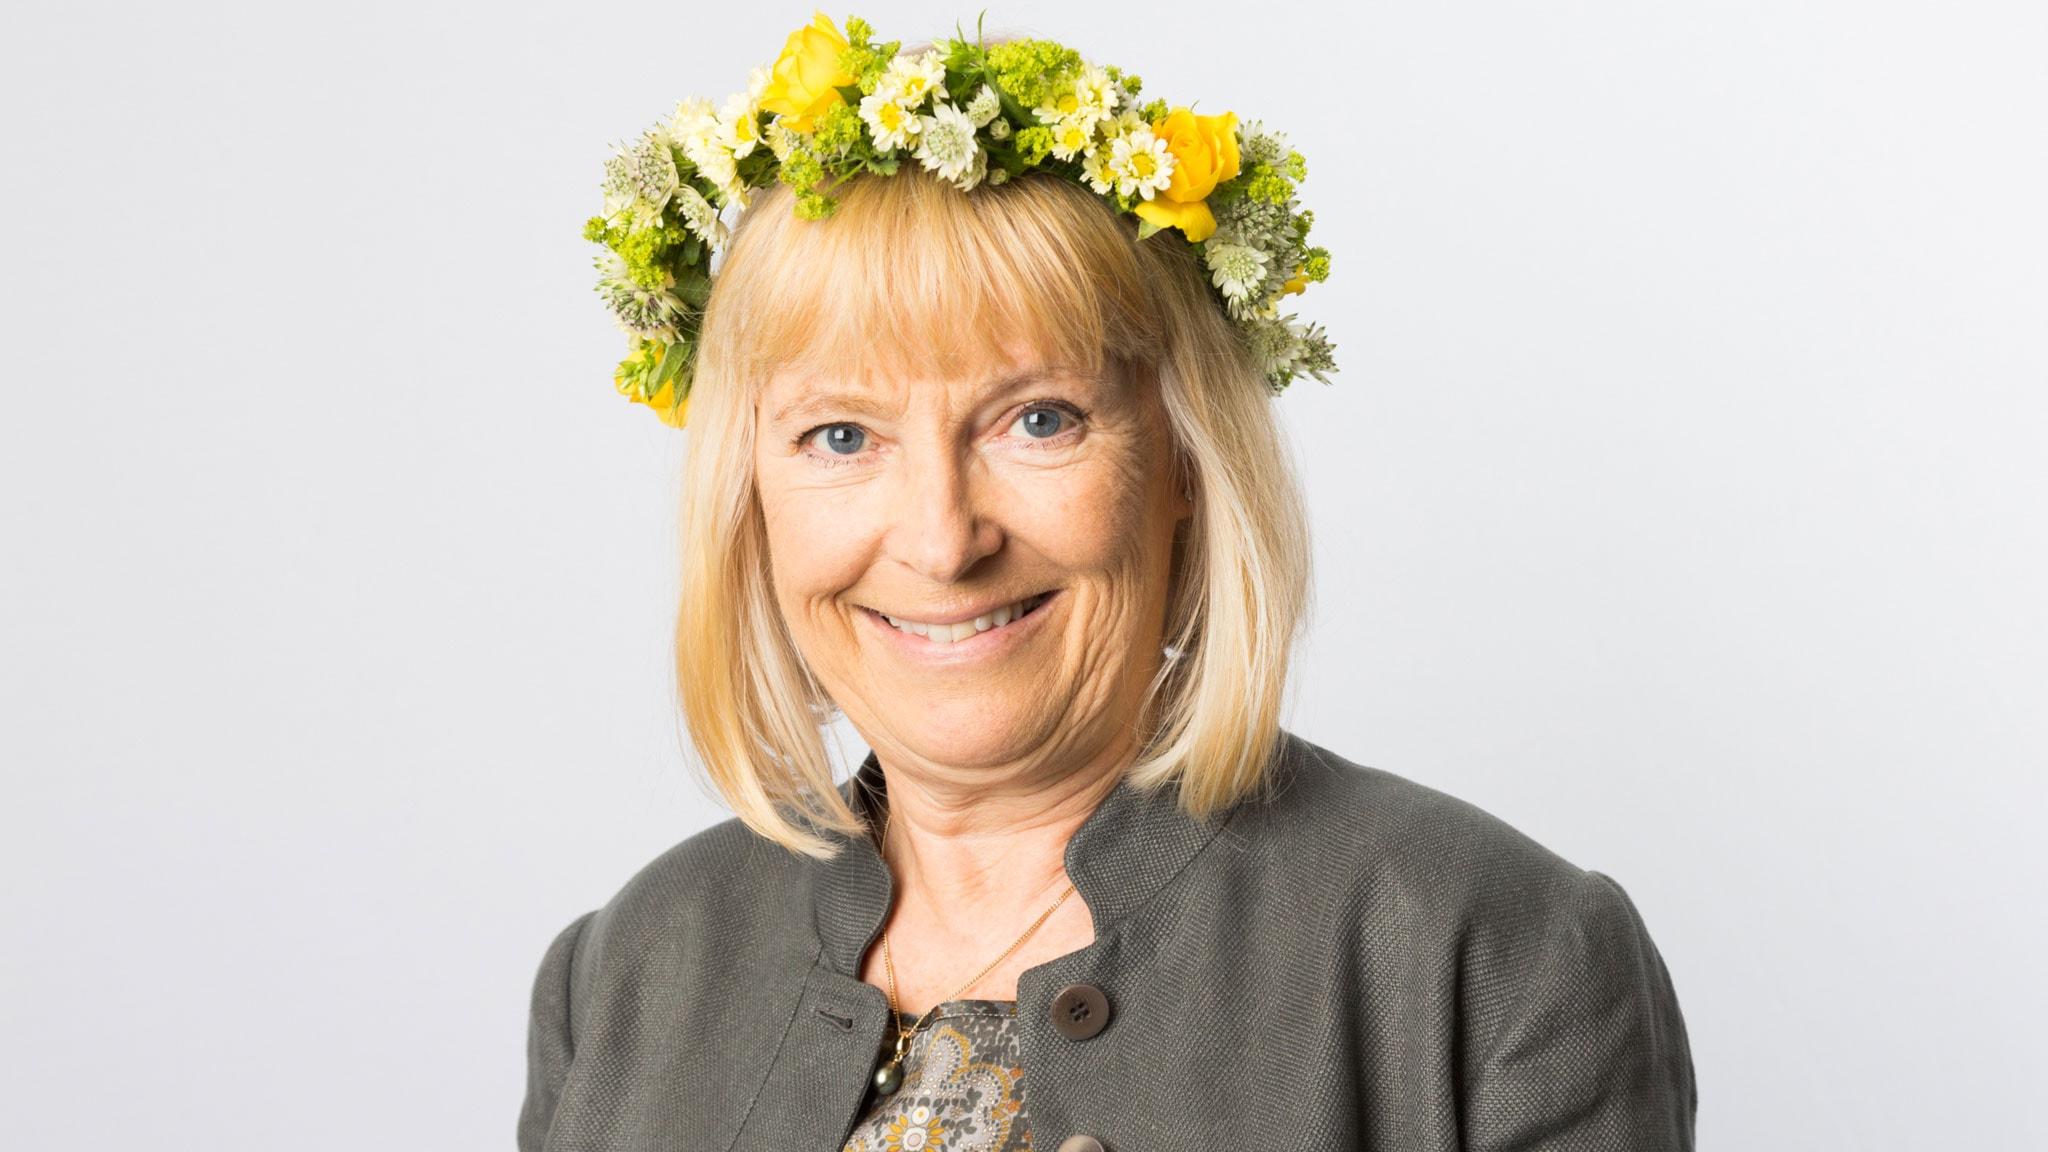 Bi Puranen med krans. Foto: Mattias Ahlm/Sveriges Radio